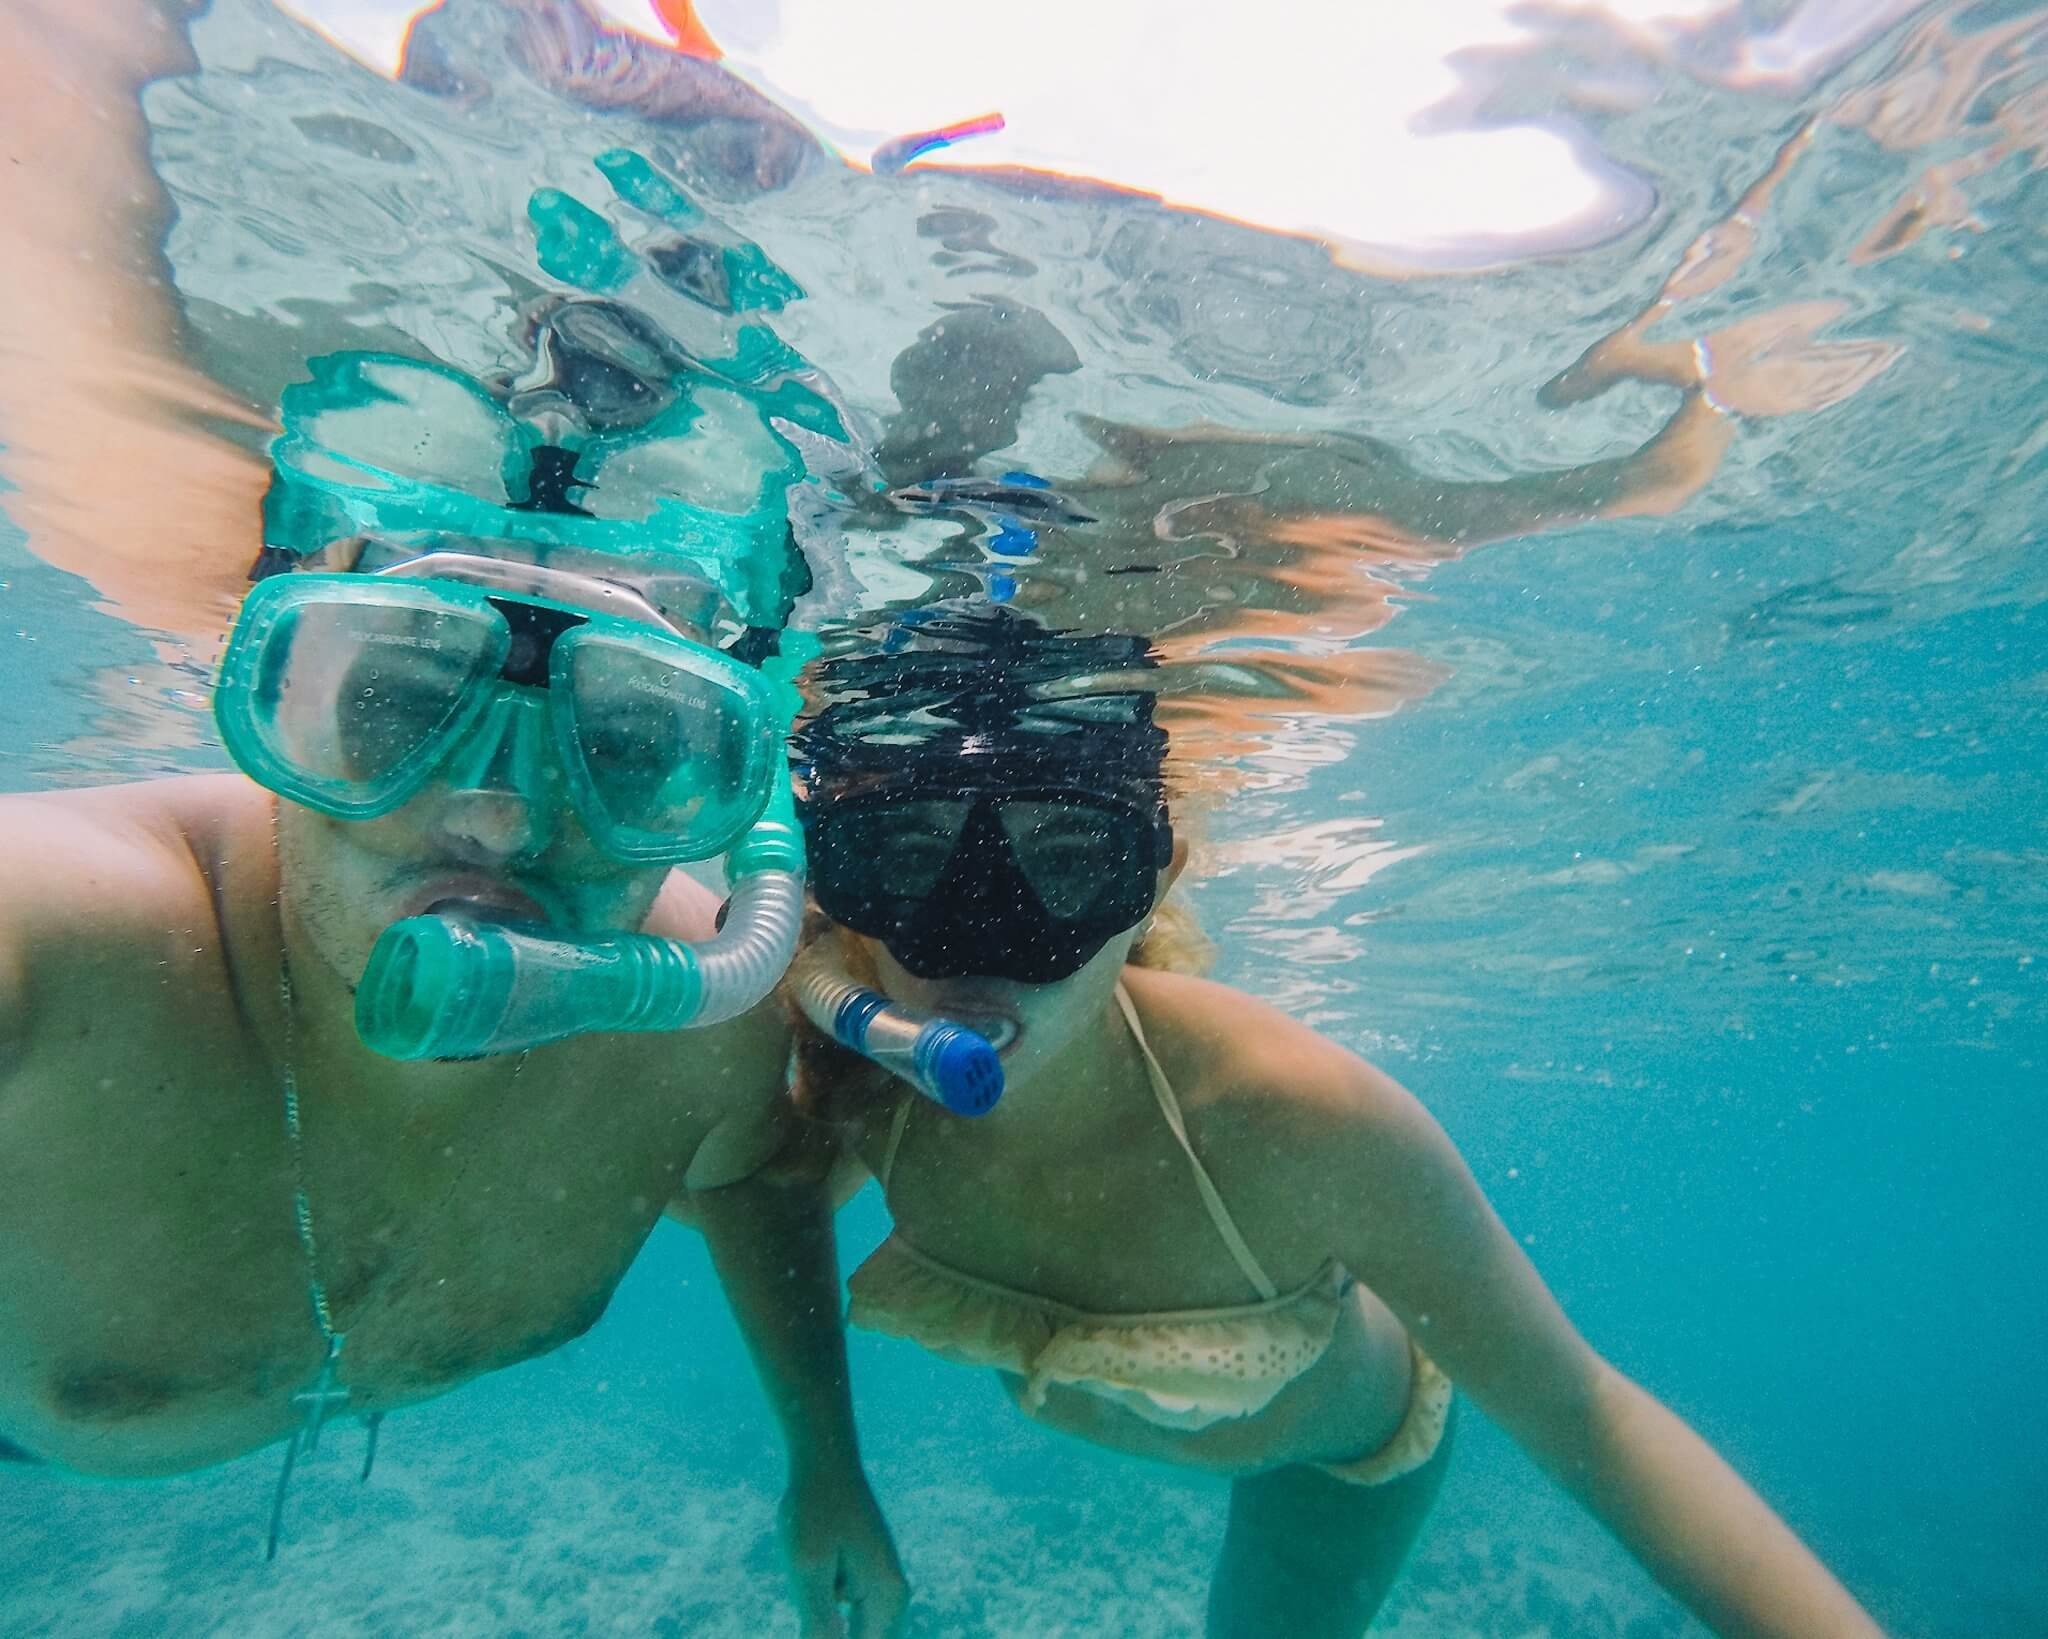 Chane and Jonathan snorkeling at Koh Tao island in Thailand